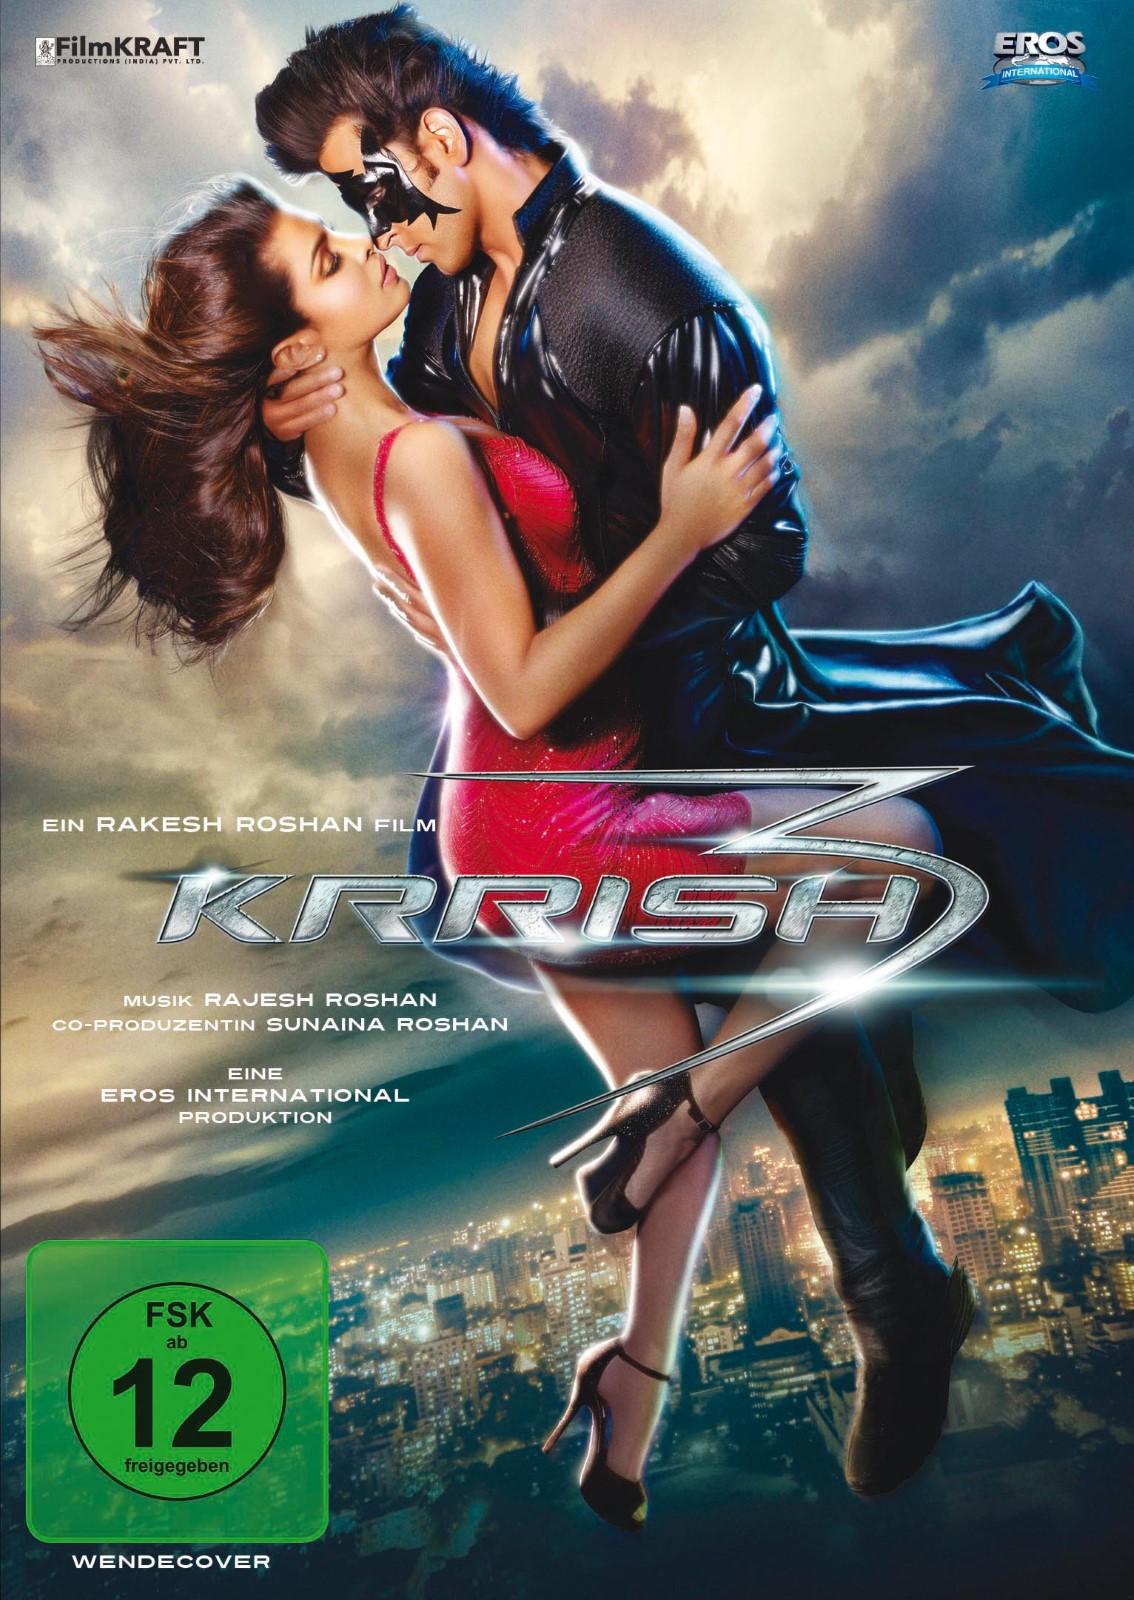 Krrish 3 Film 2013 Filmstarts De